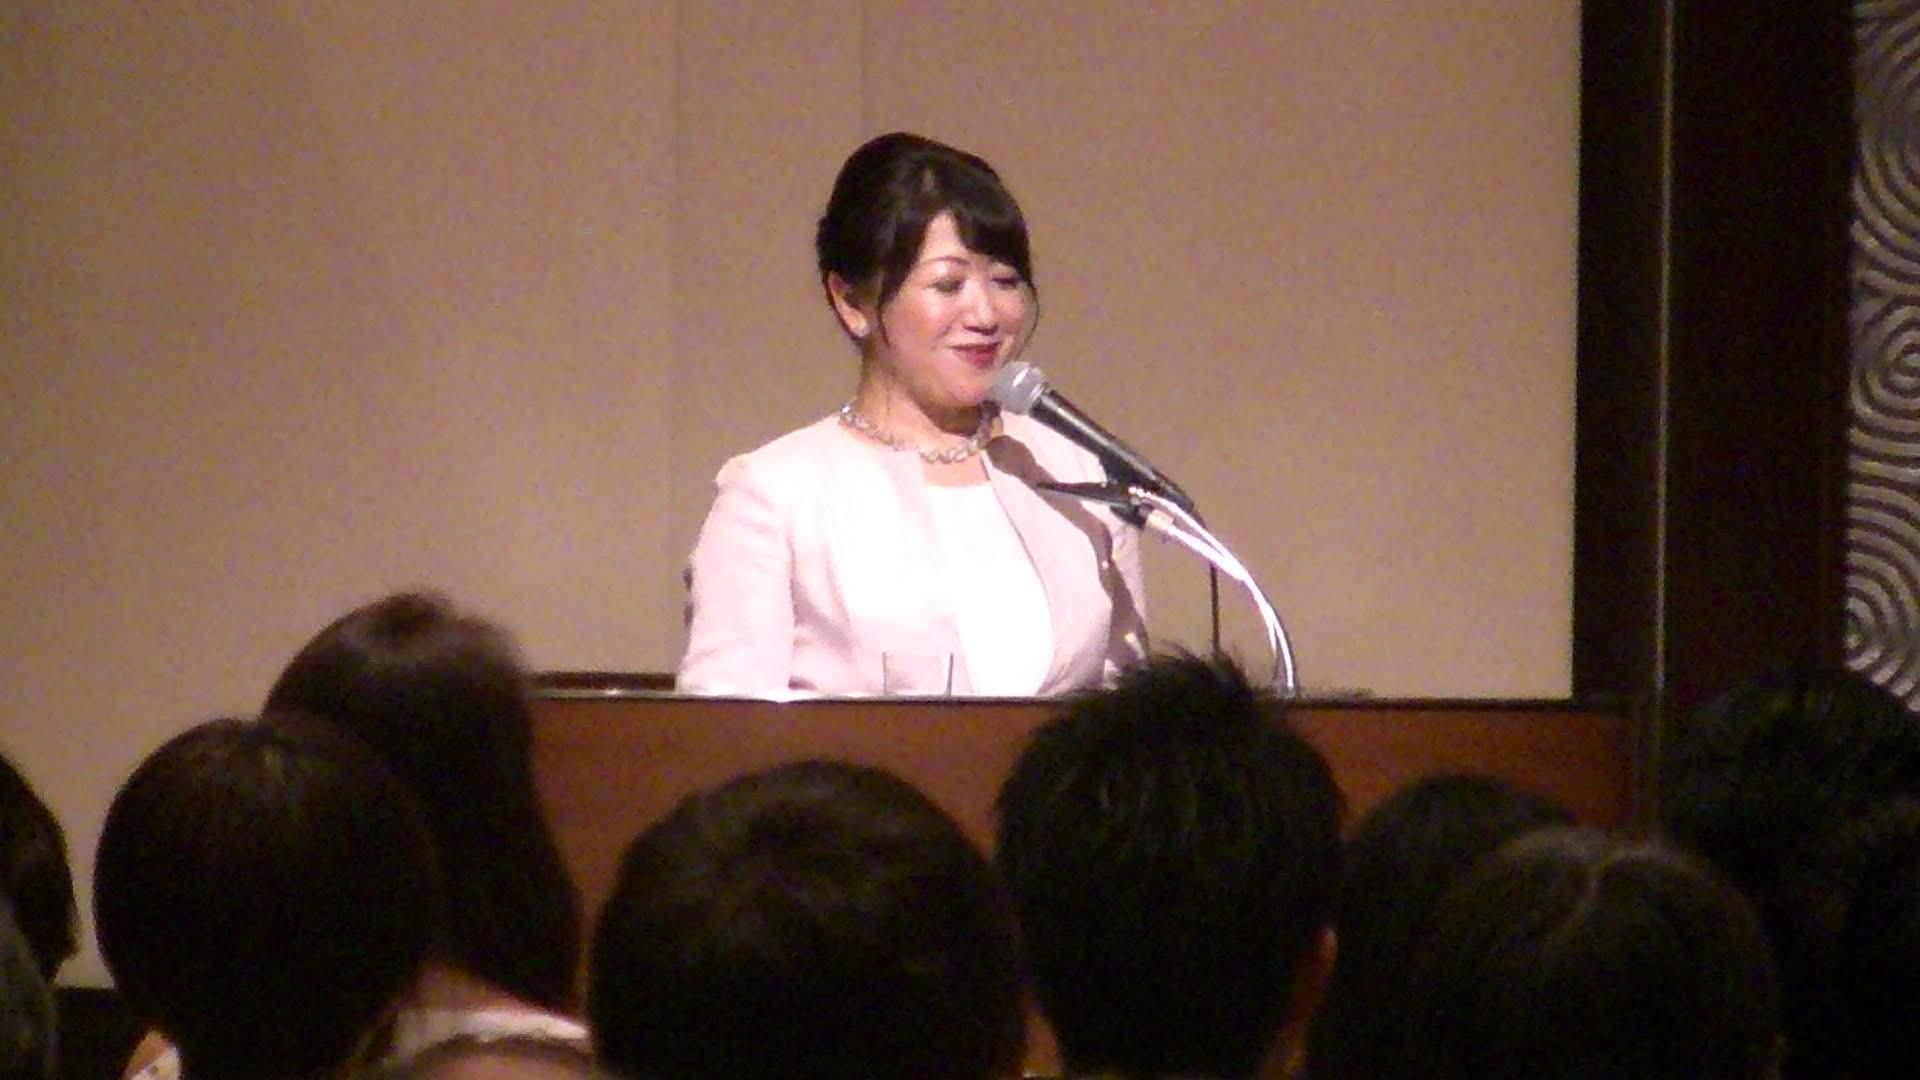 PIC 1625 1 - 思風会全国大会in広島